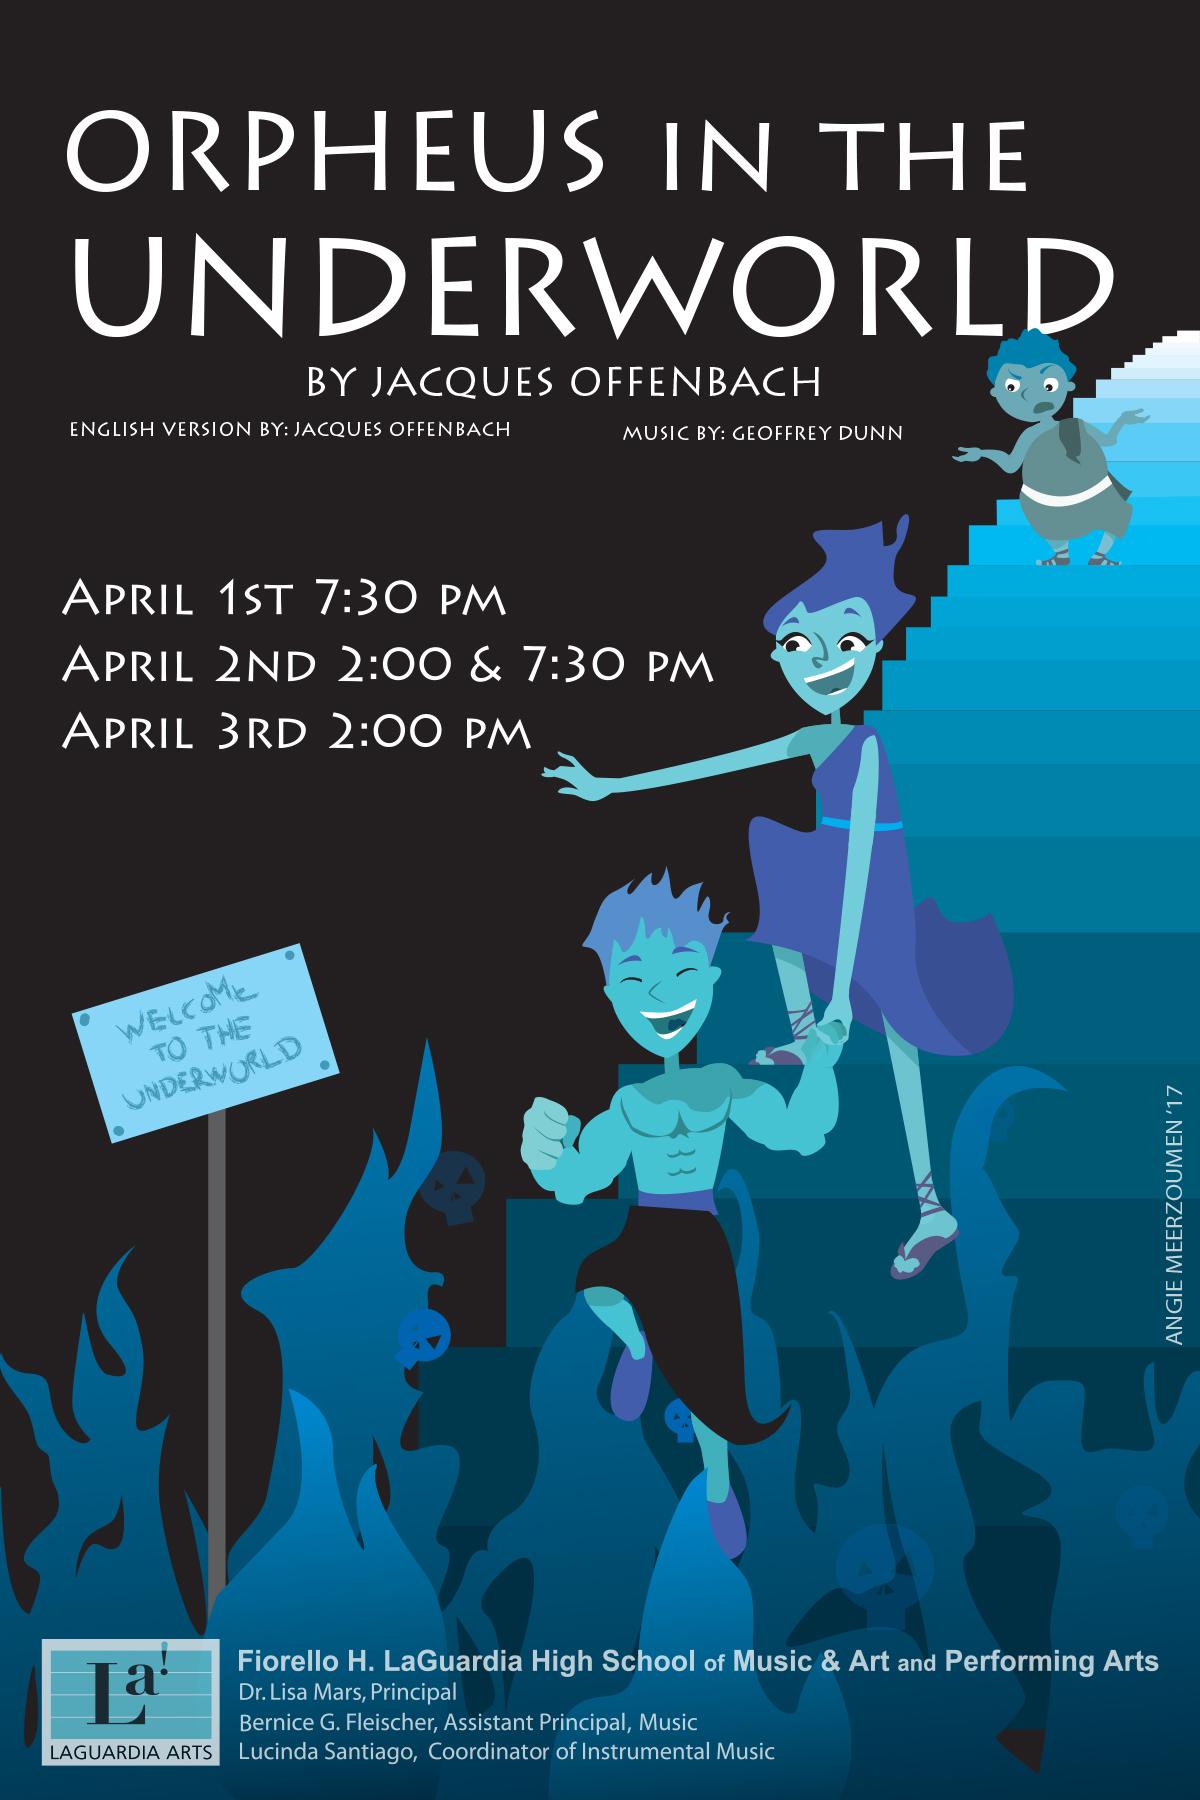 Annual Opera: Orpheus in the Underworld